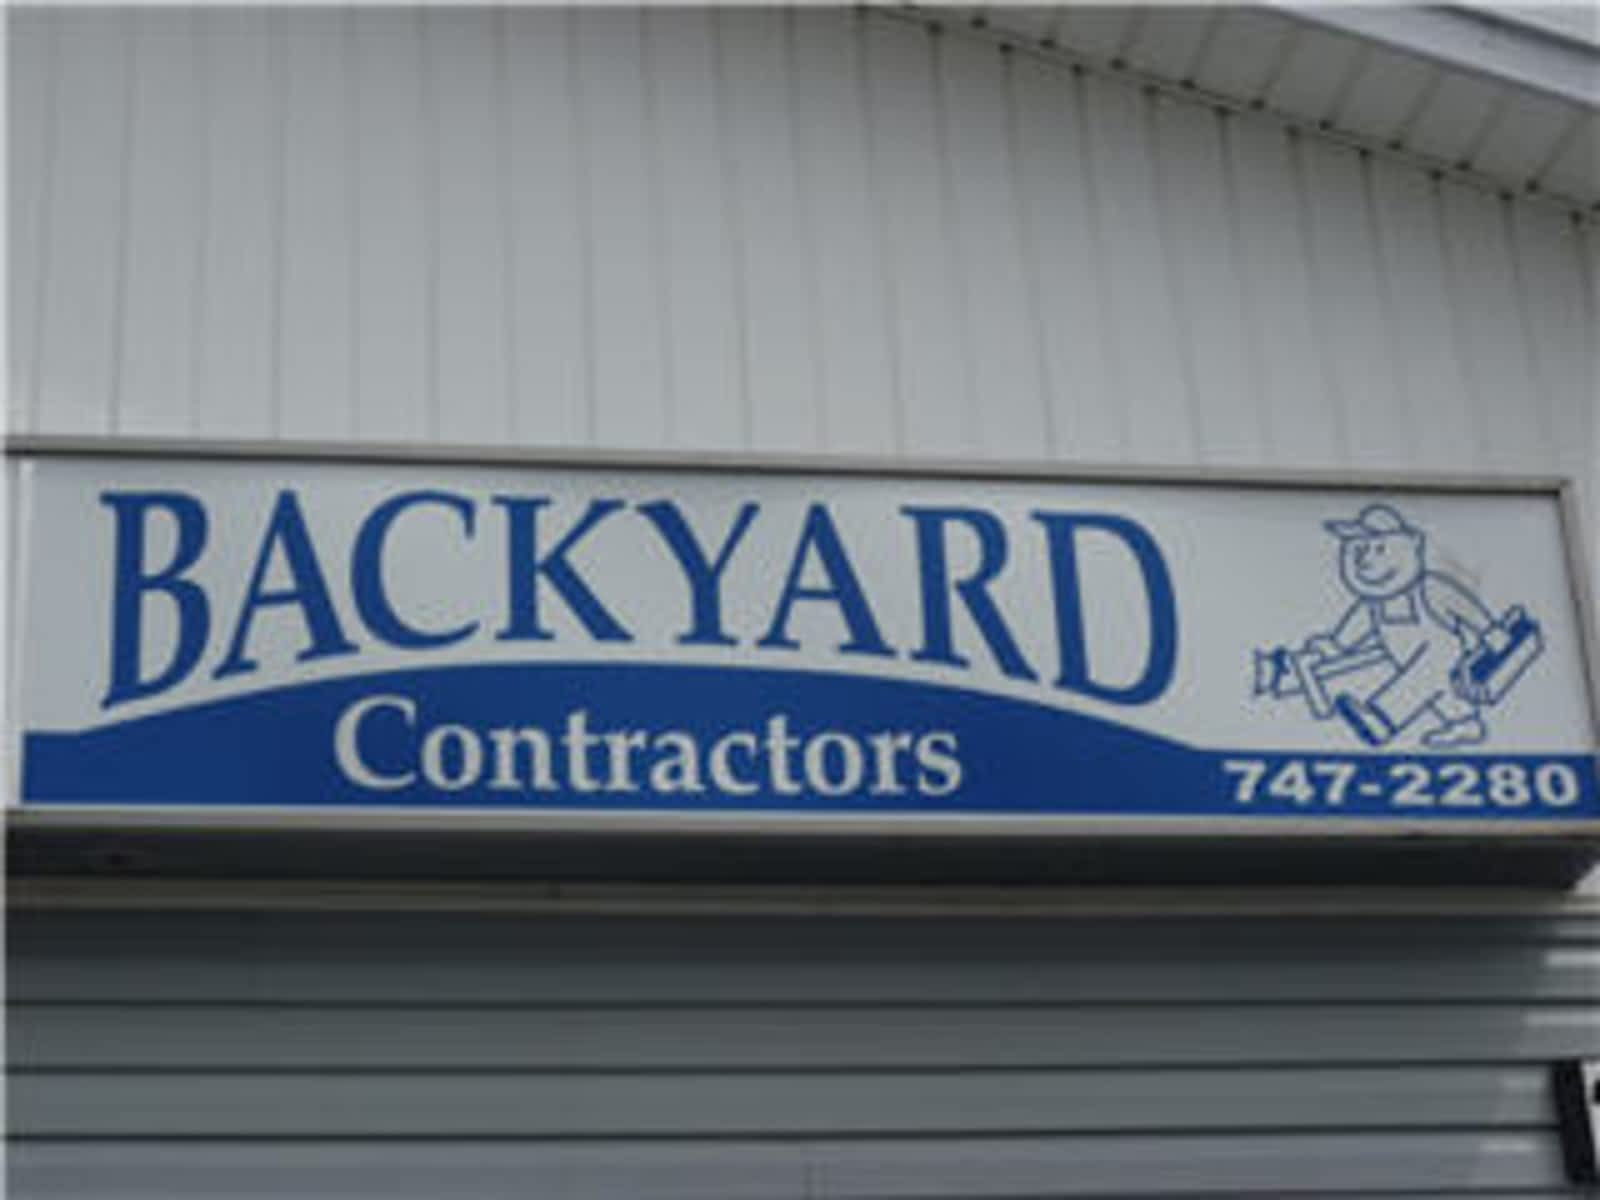 Backyard Contractors Opening Hours 201 203 Commonwealth Ave